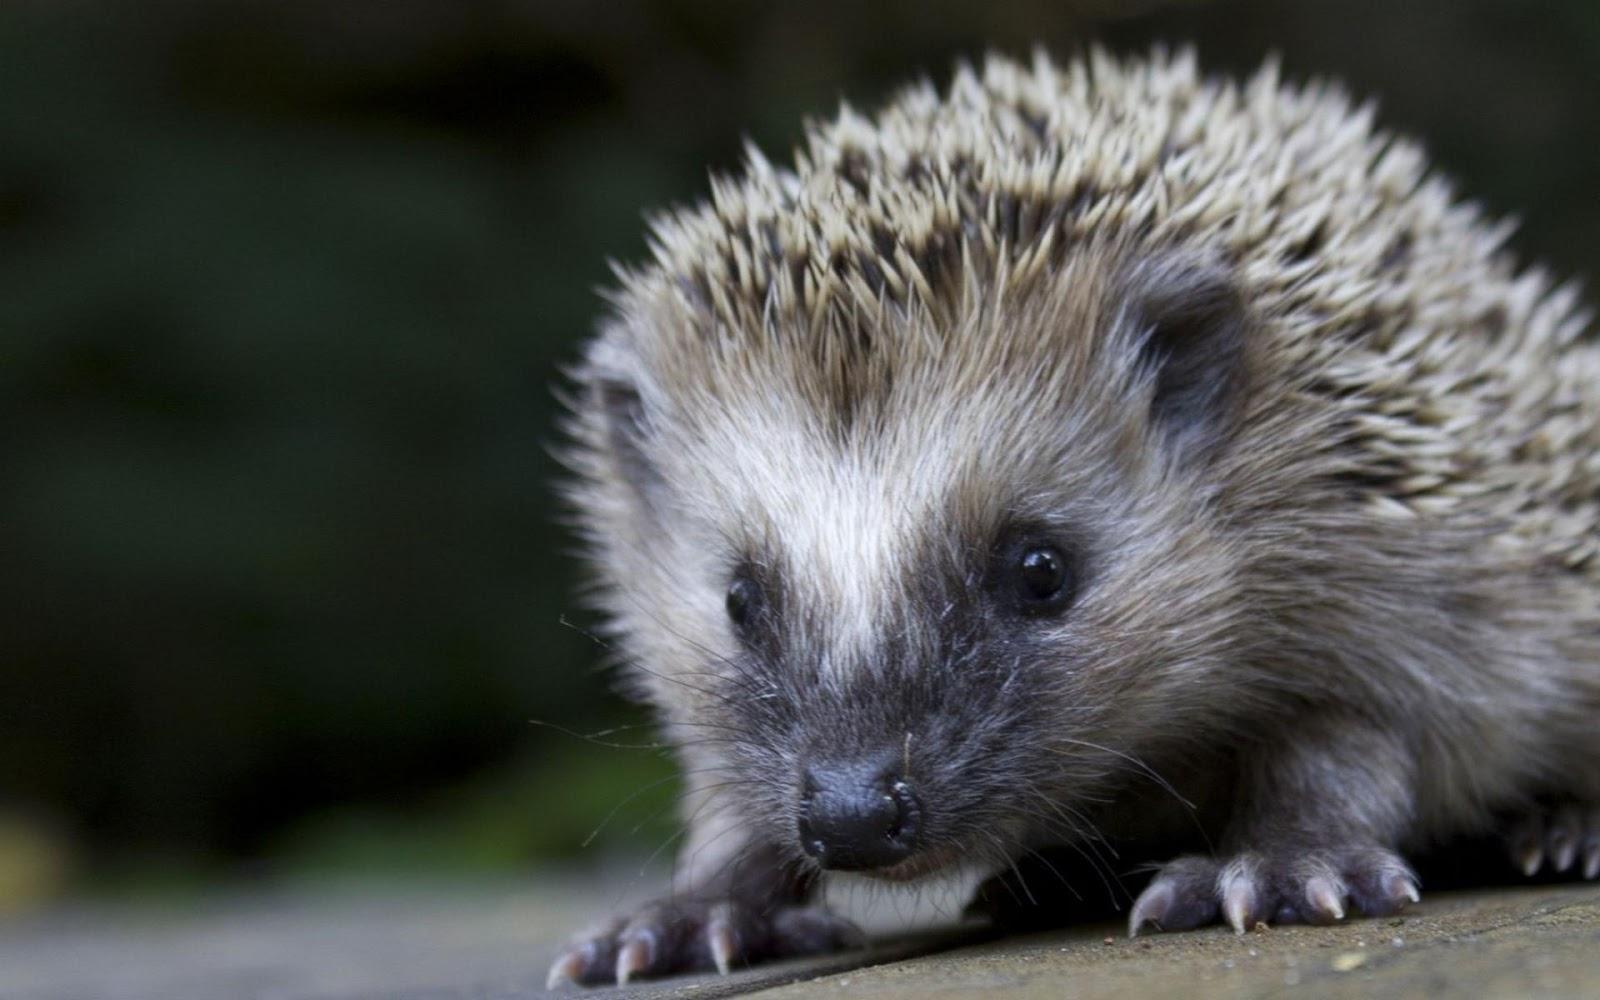 http://1.bp.blogspot.com/-E0mR45ije8Y/UNHPkZ1AHwI/AAAAAAAALIg/ll9vWSLvUdU/s1600/Cute-Hedgehog-1200.jpg